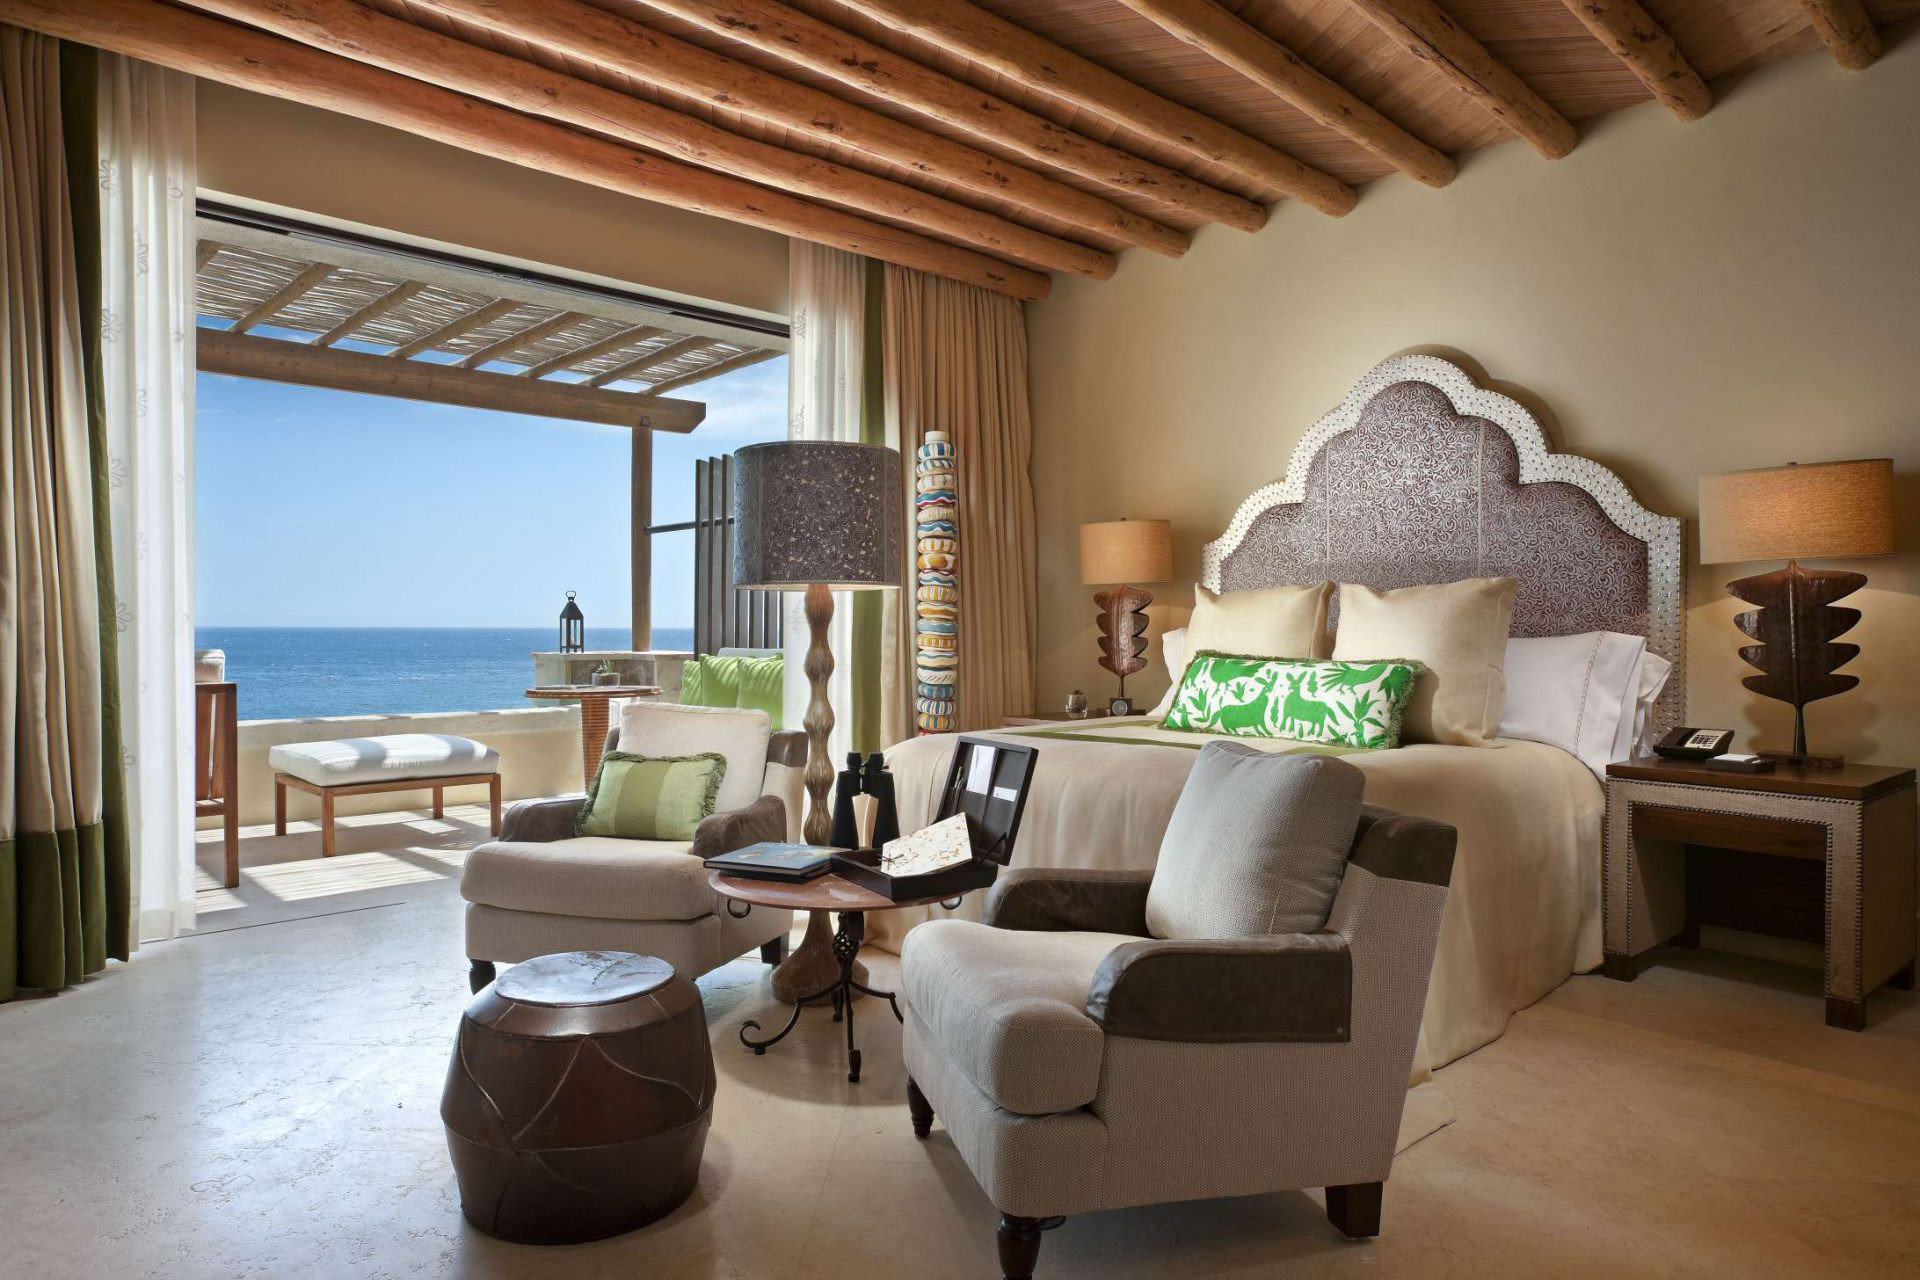 sofa living room property home cottage hardwood Villa Suite condominium nice farmhouse Bedroom